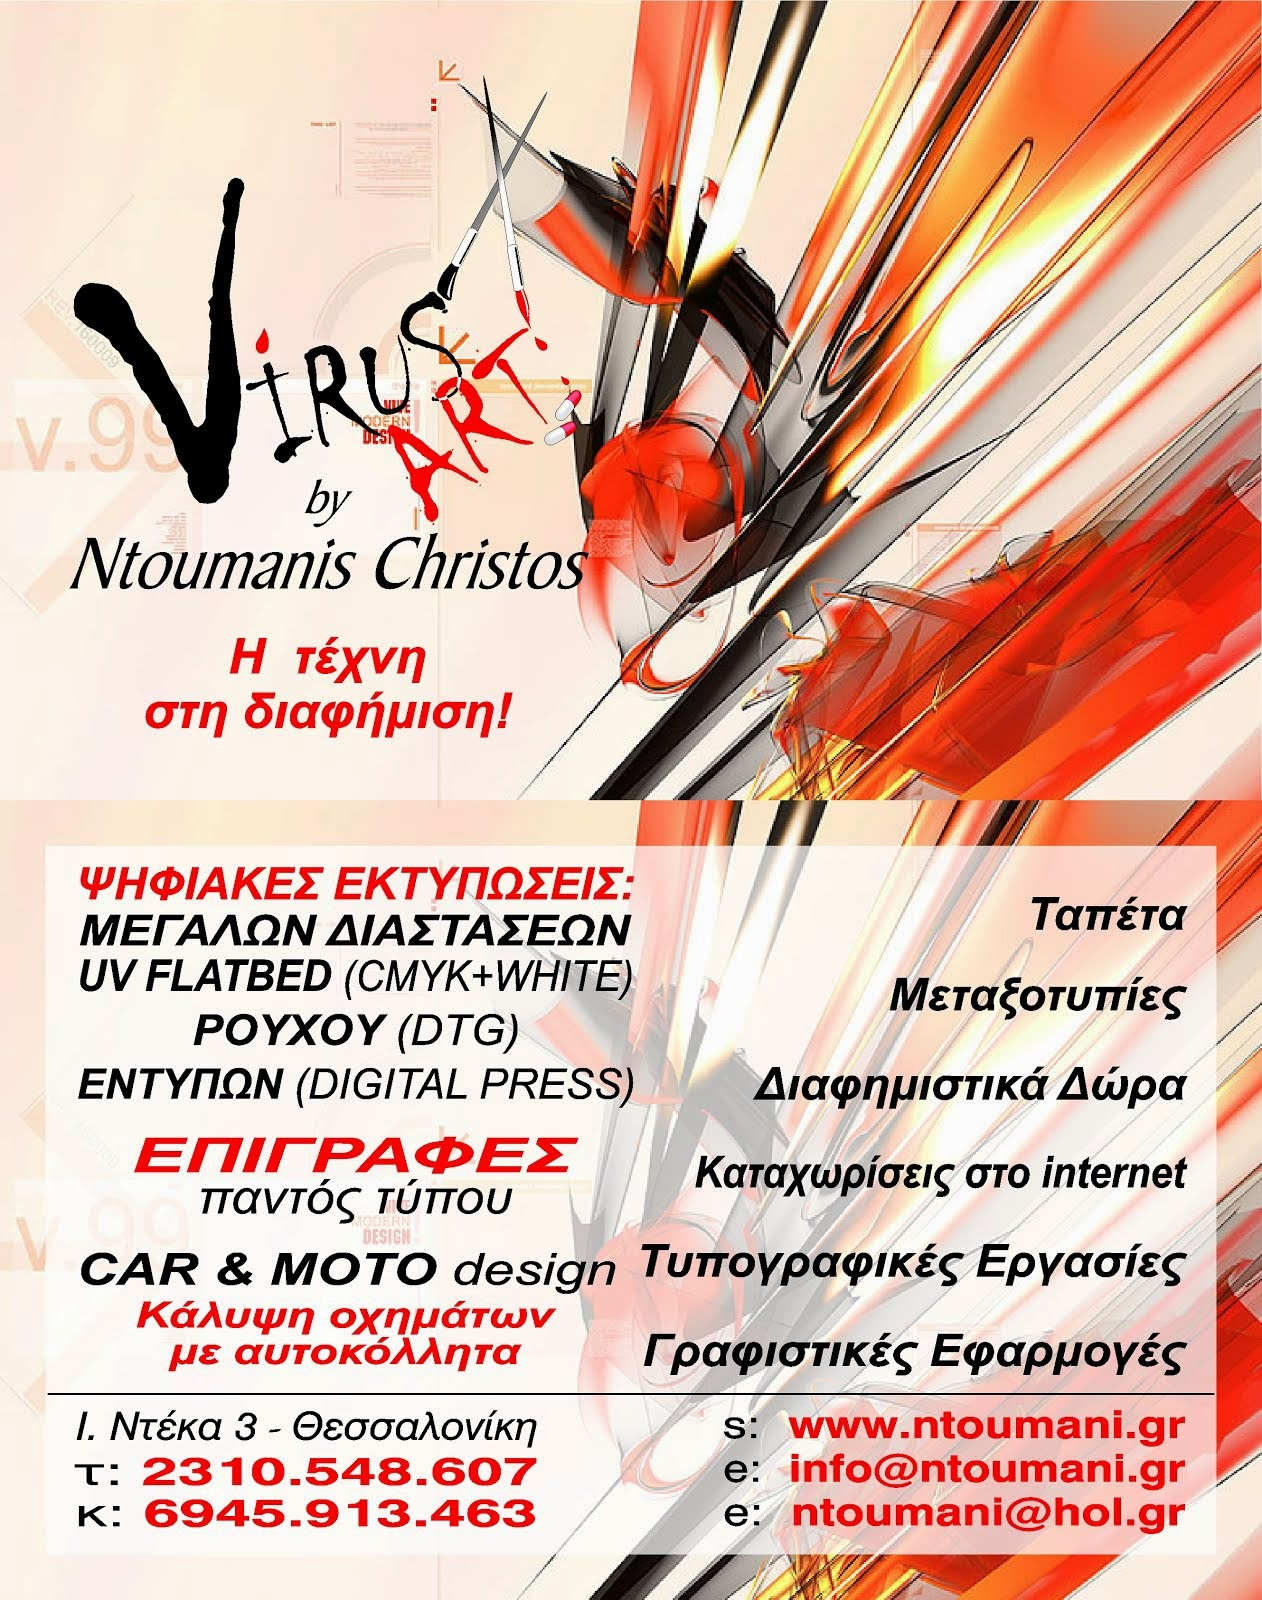 VIRUS ART / ΝΤΟΥΜΑΝΗΣ ΧΡΗΣΤΟΣ